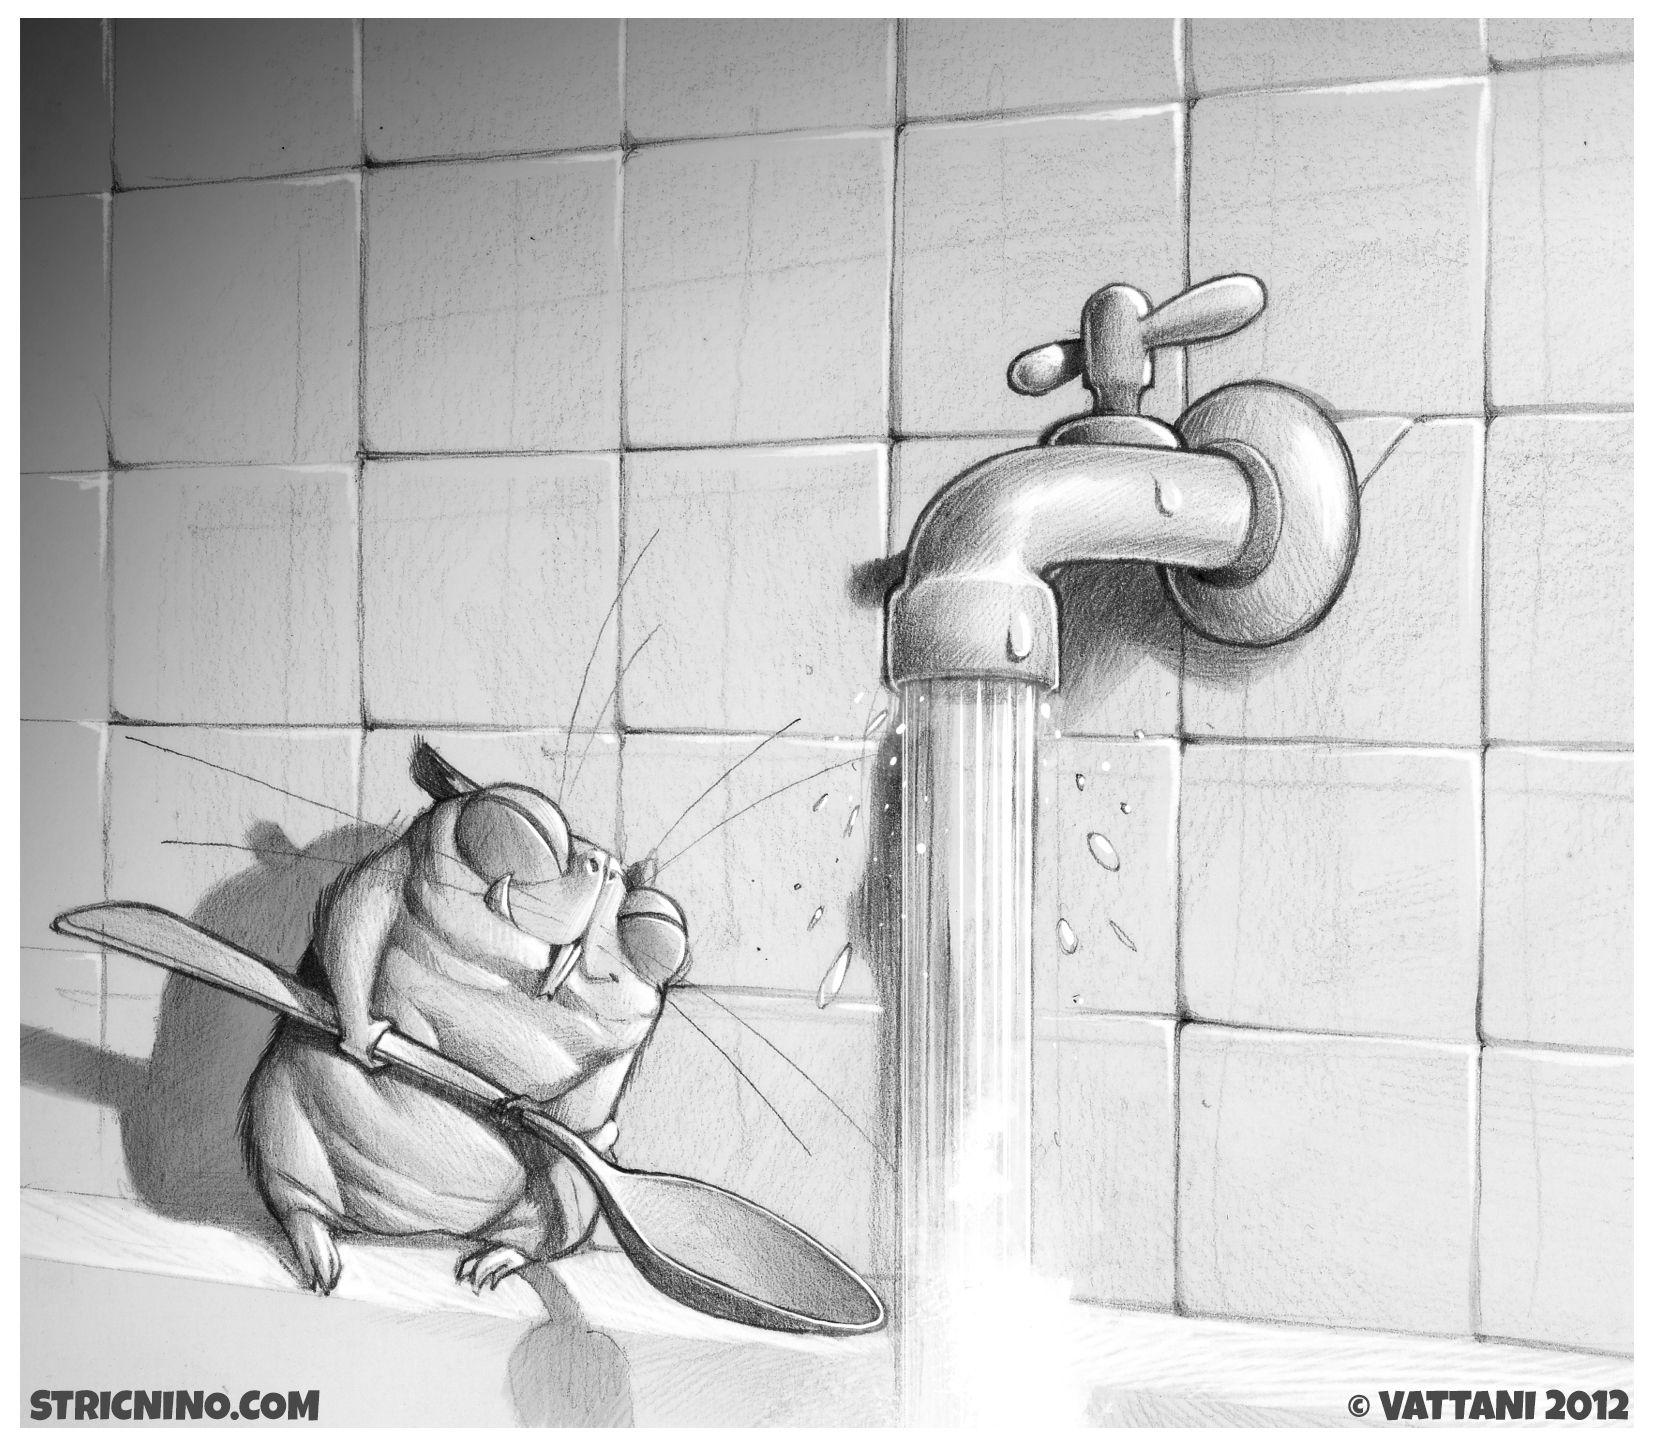 Episode 010 - #sketch #illustration #art #hamster #animals #mouse #hate #badboy #stricnino #water #disaster